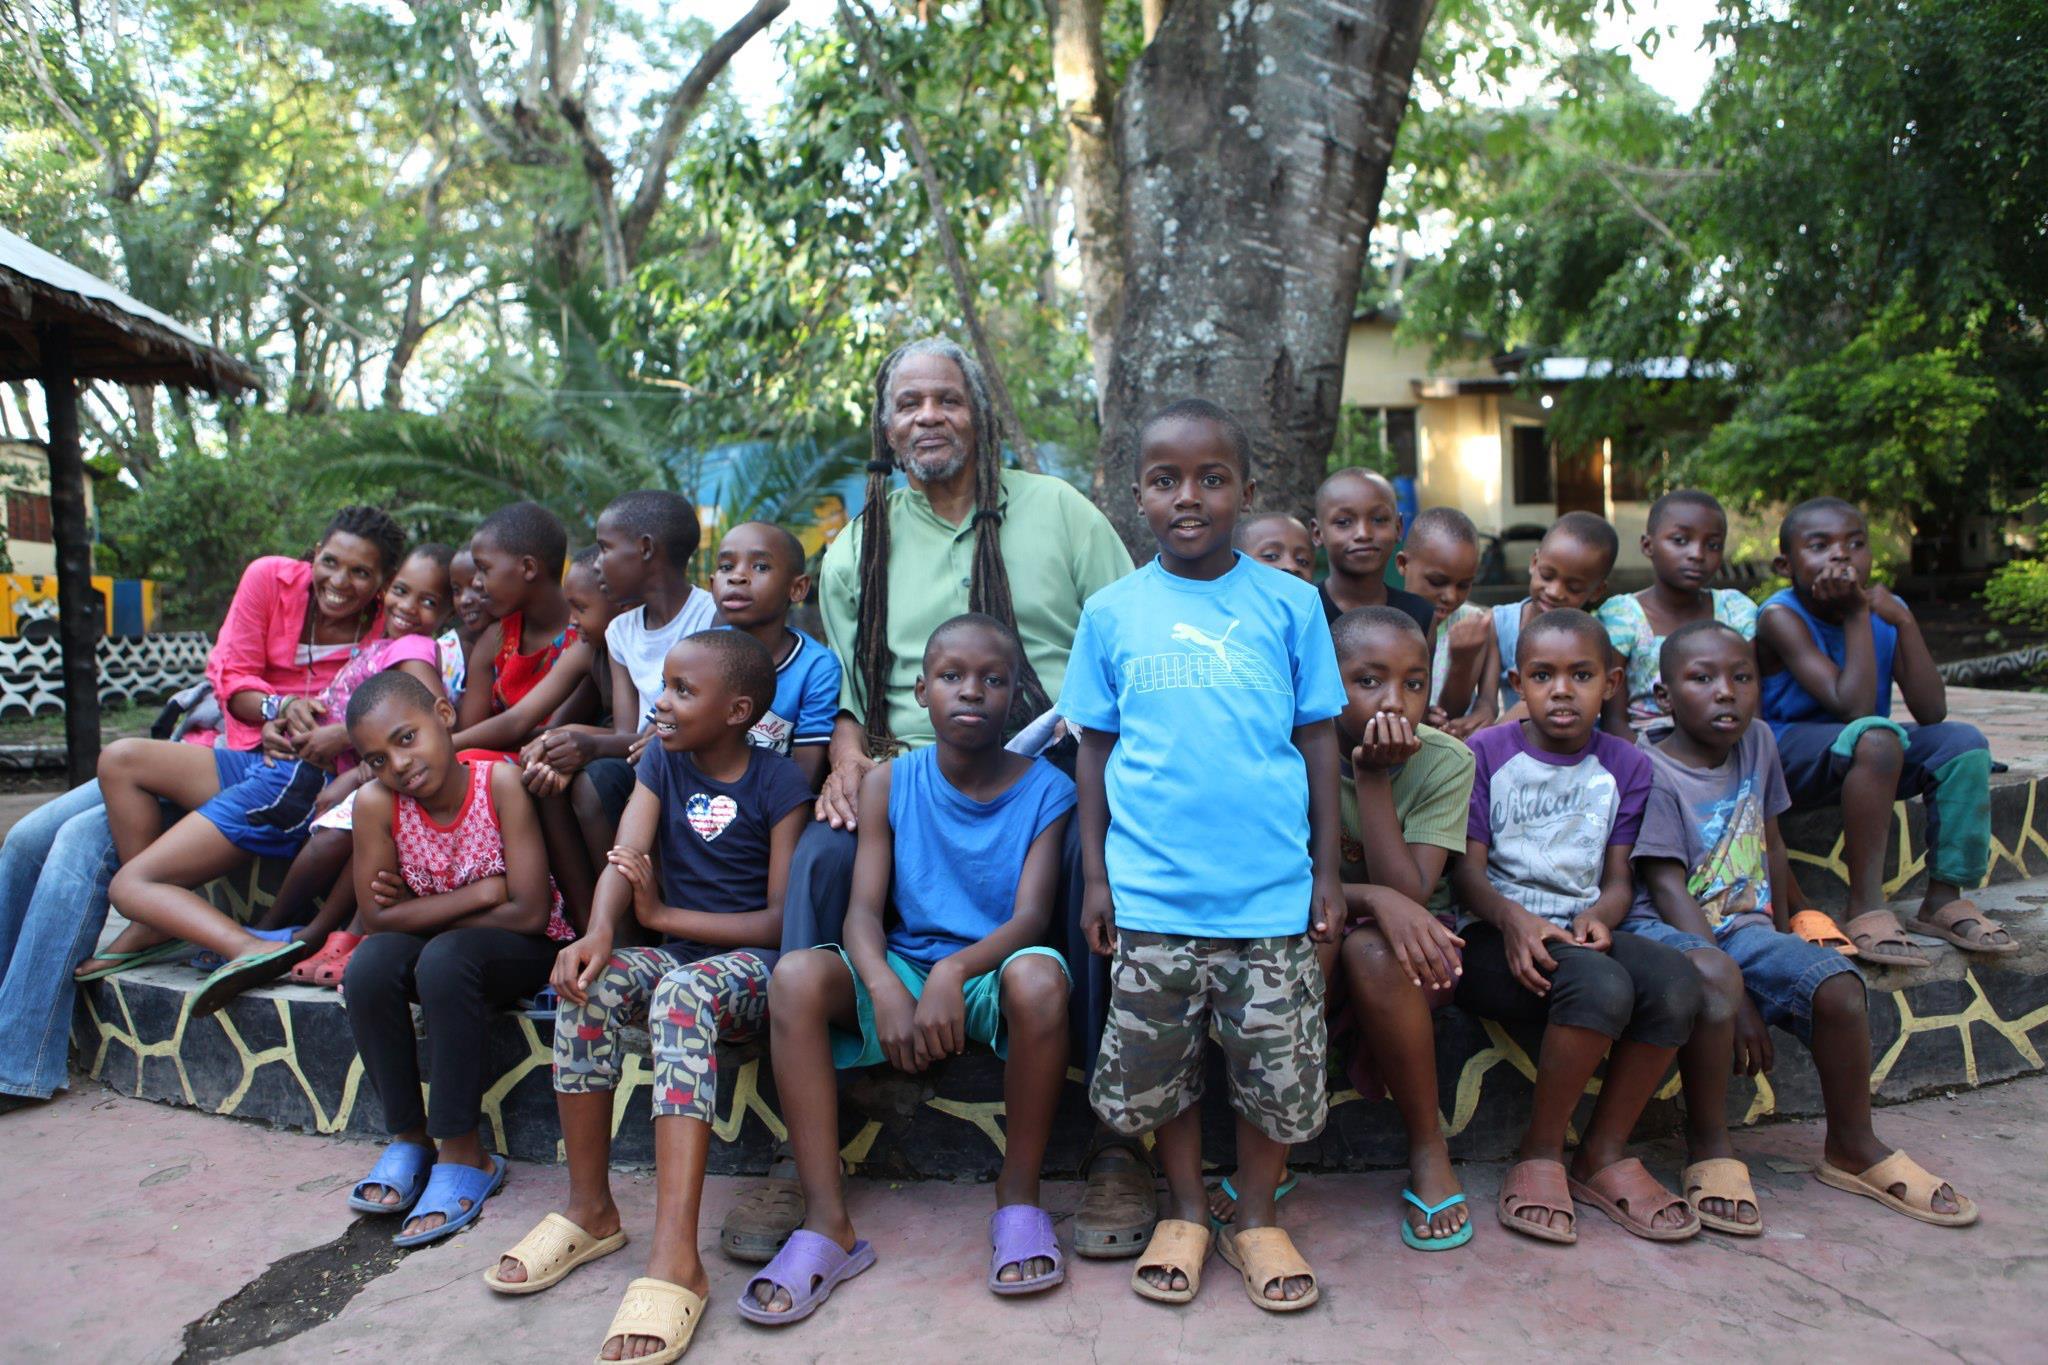 Babu and the kids